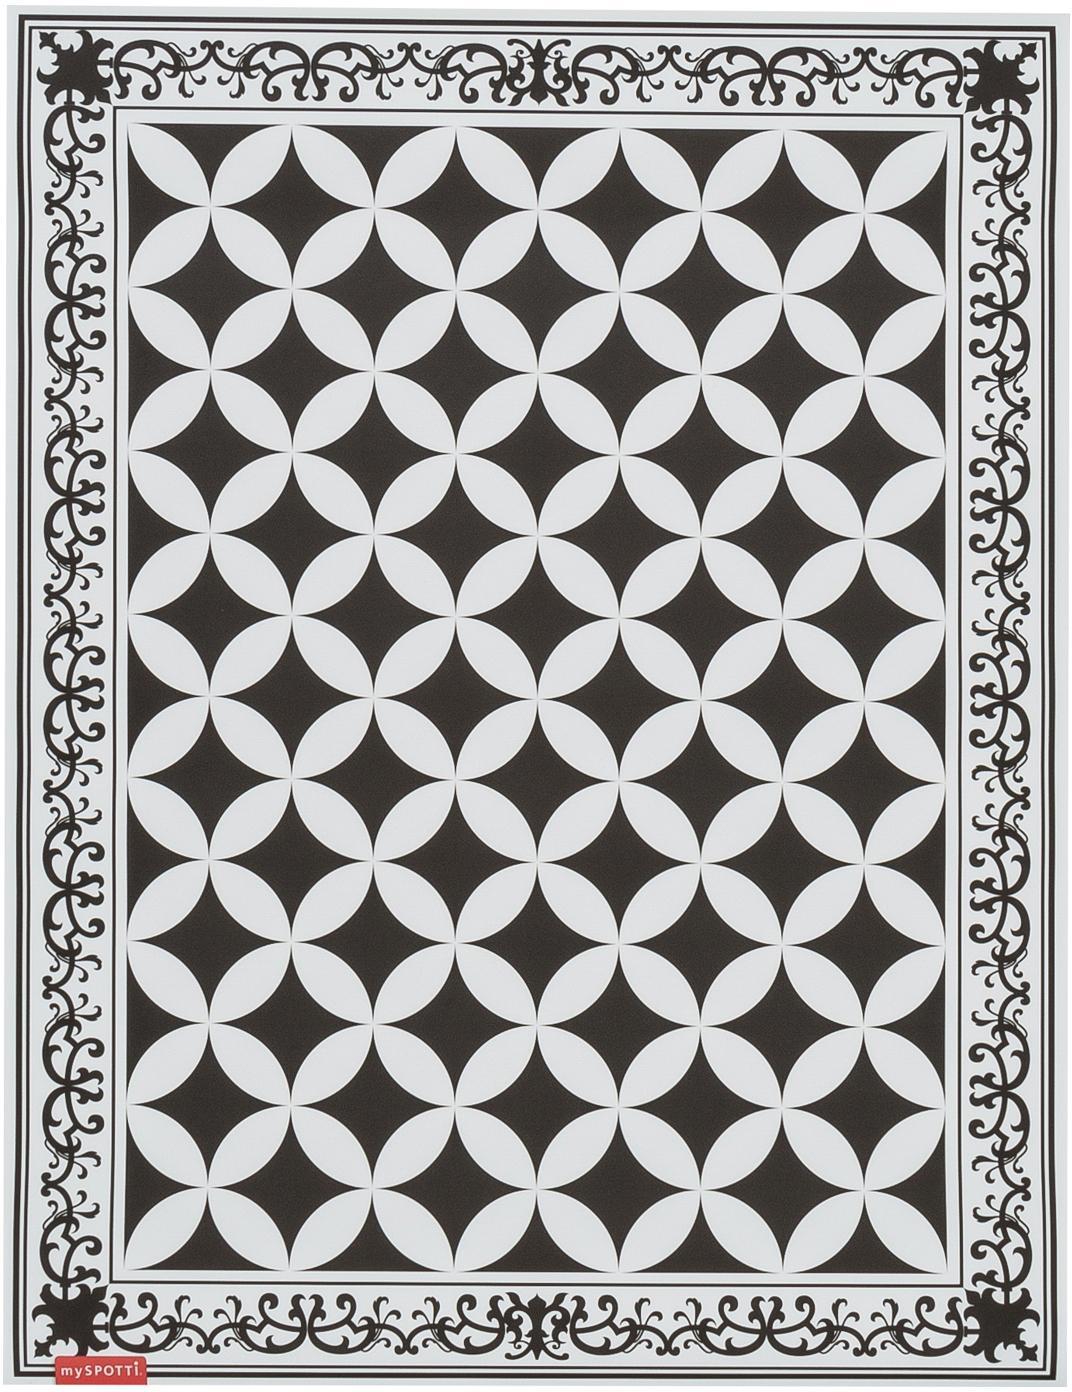 Tappetino in vinile Chadi, Vinile, Nero, bianco, Larg. 65 x Lung. 85 cm